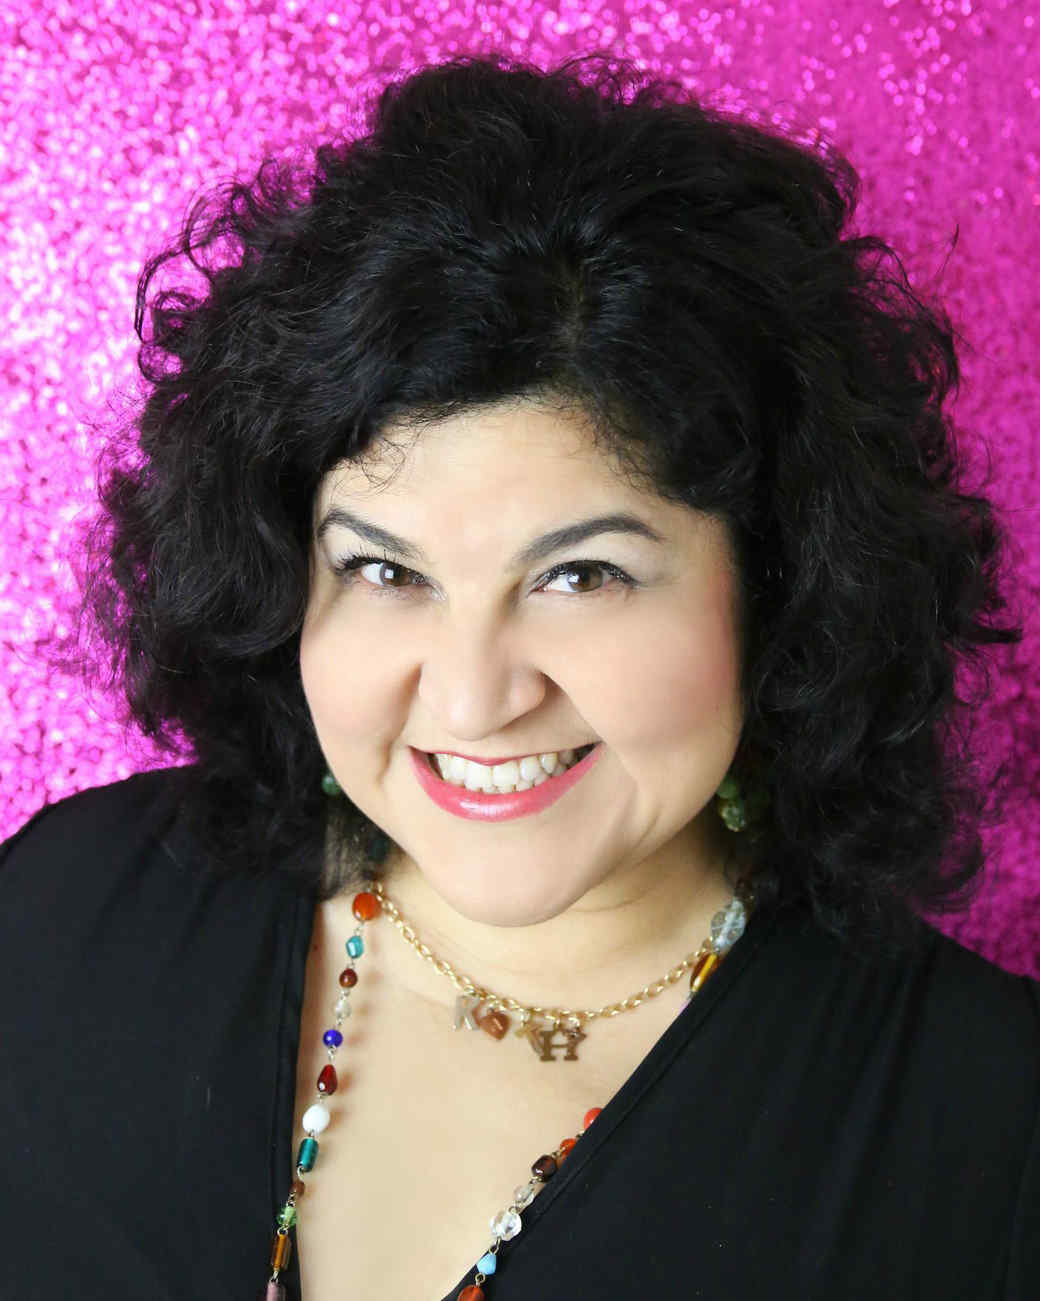 Kathy Cano Murillo portrait